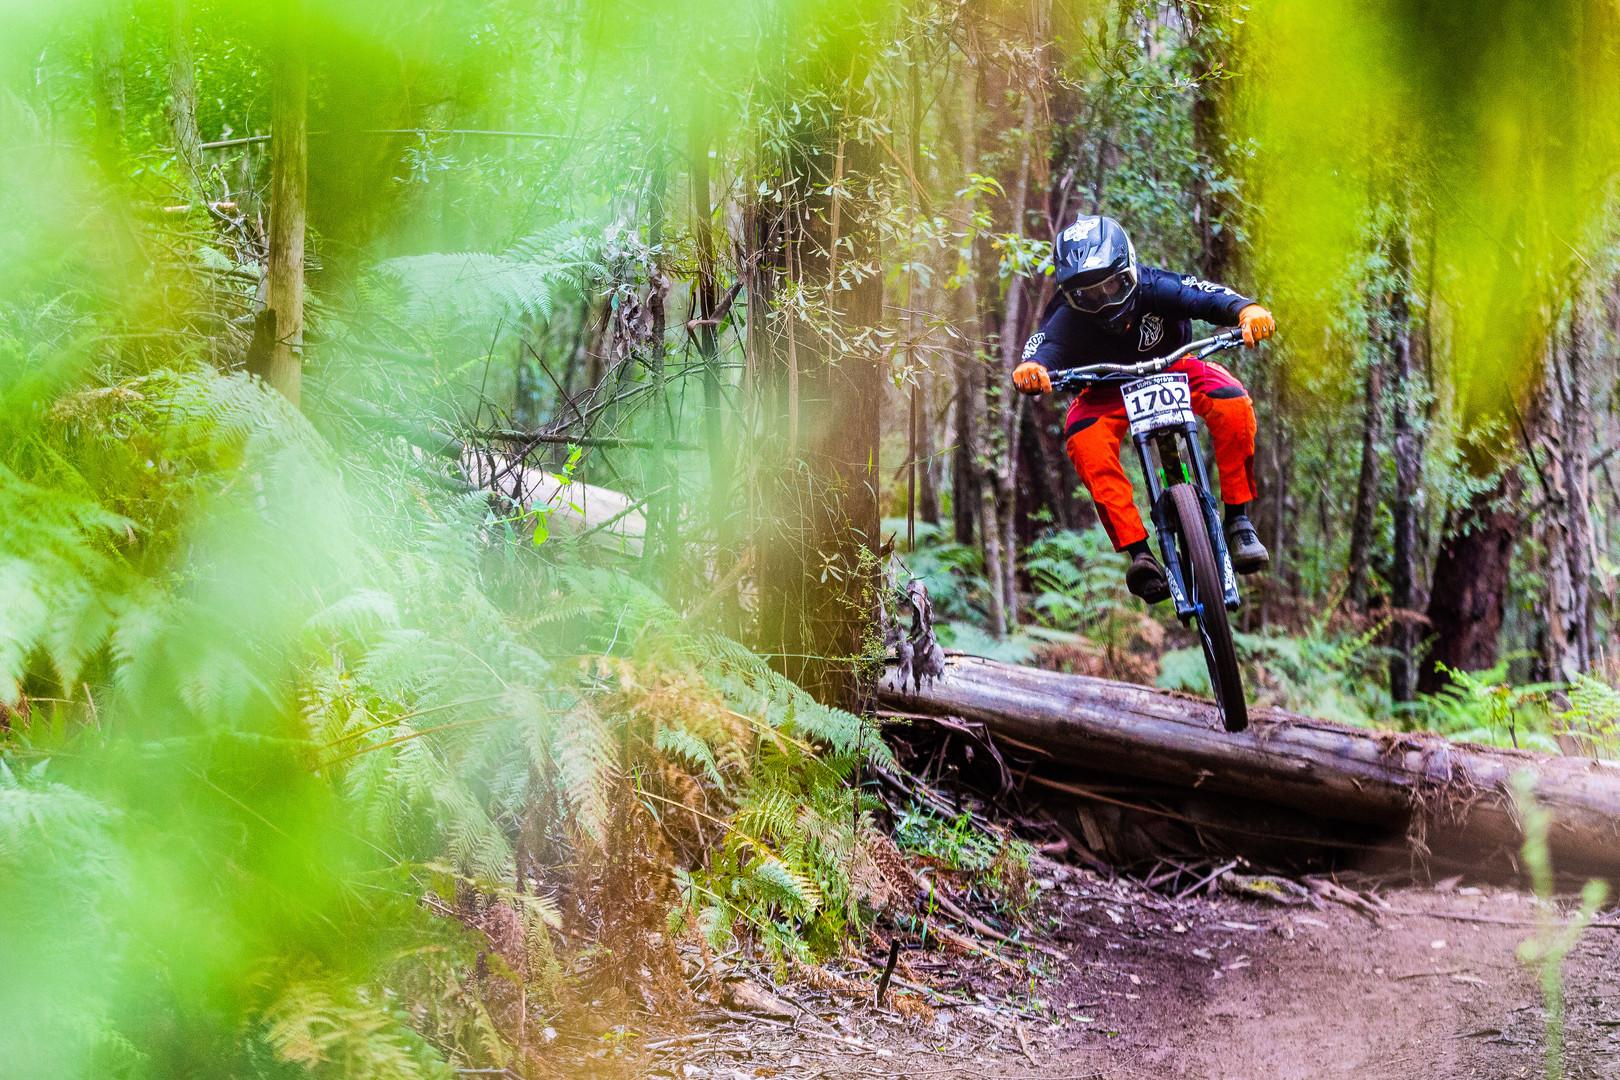 Rider at VDHS ROund 2 19/20